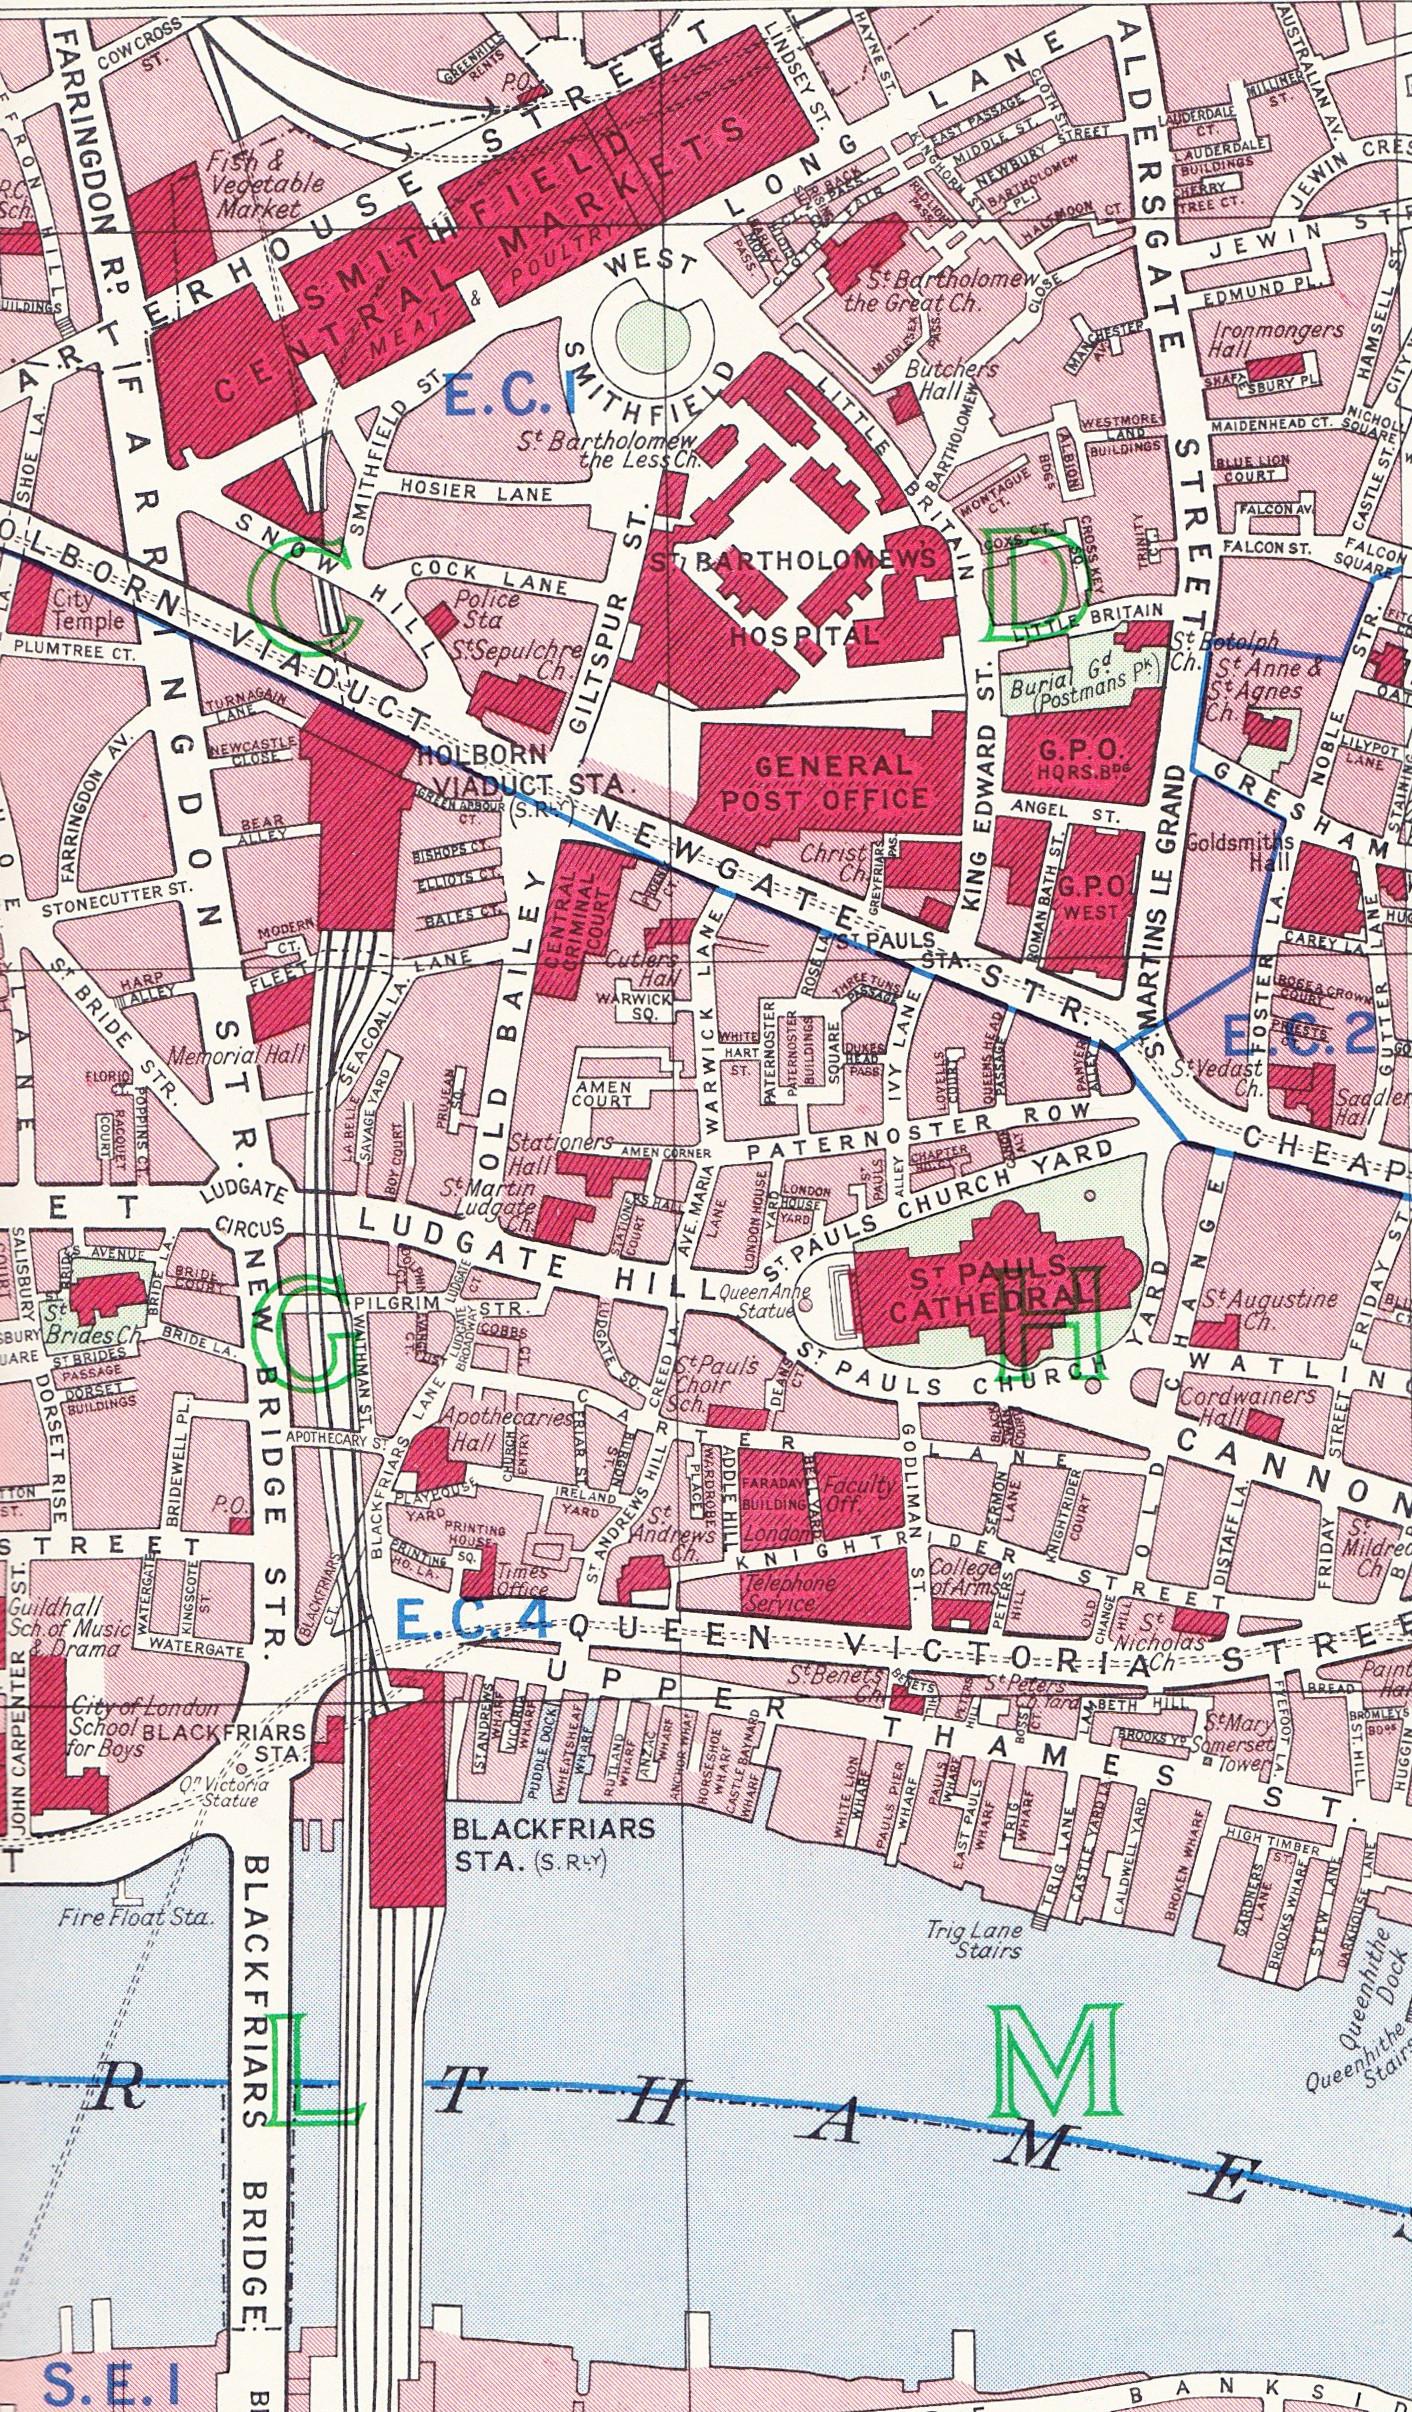 London Atlas Map.London Maps A London Inheritance